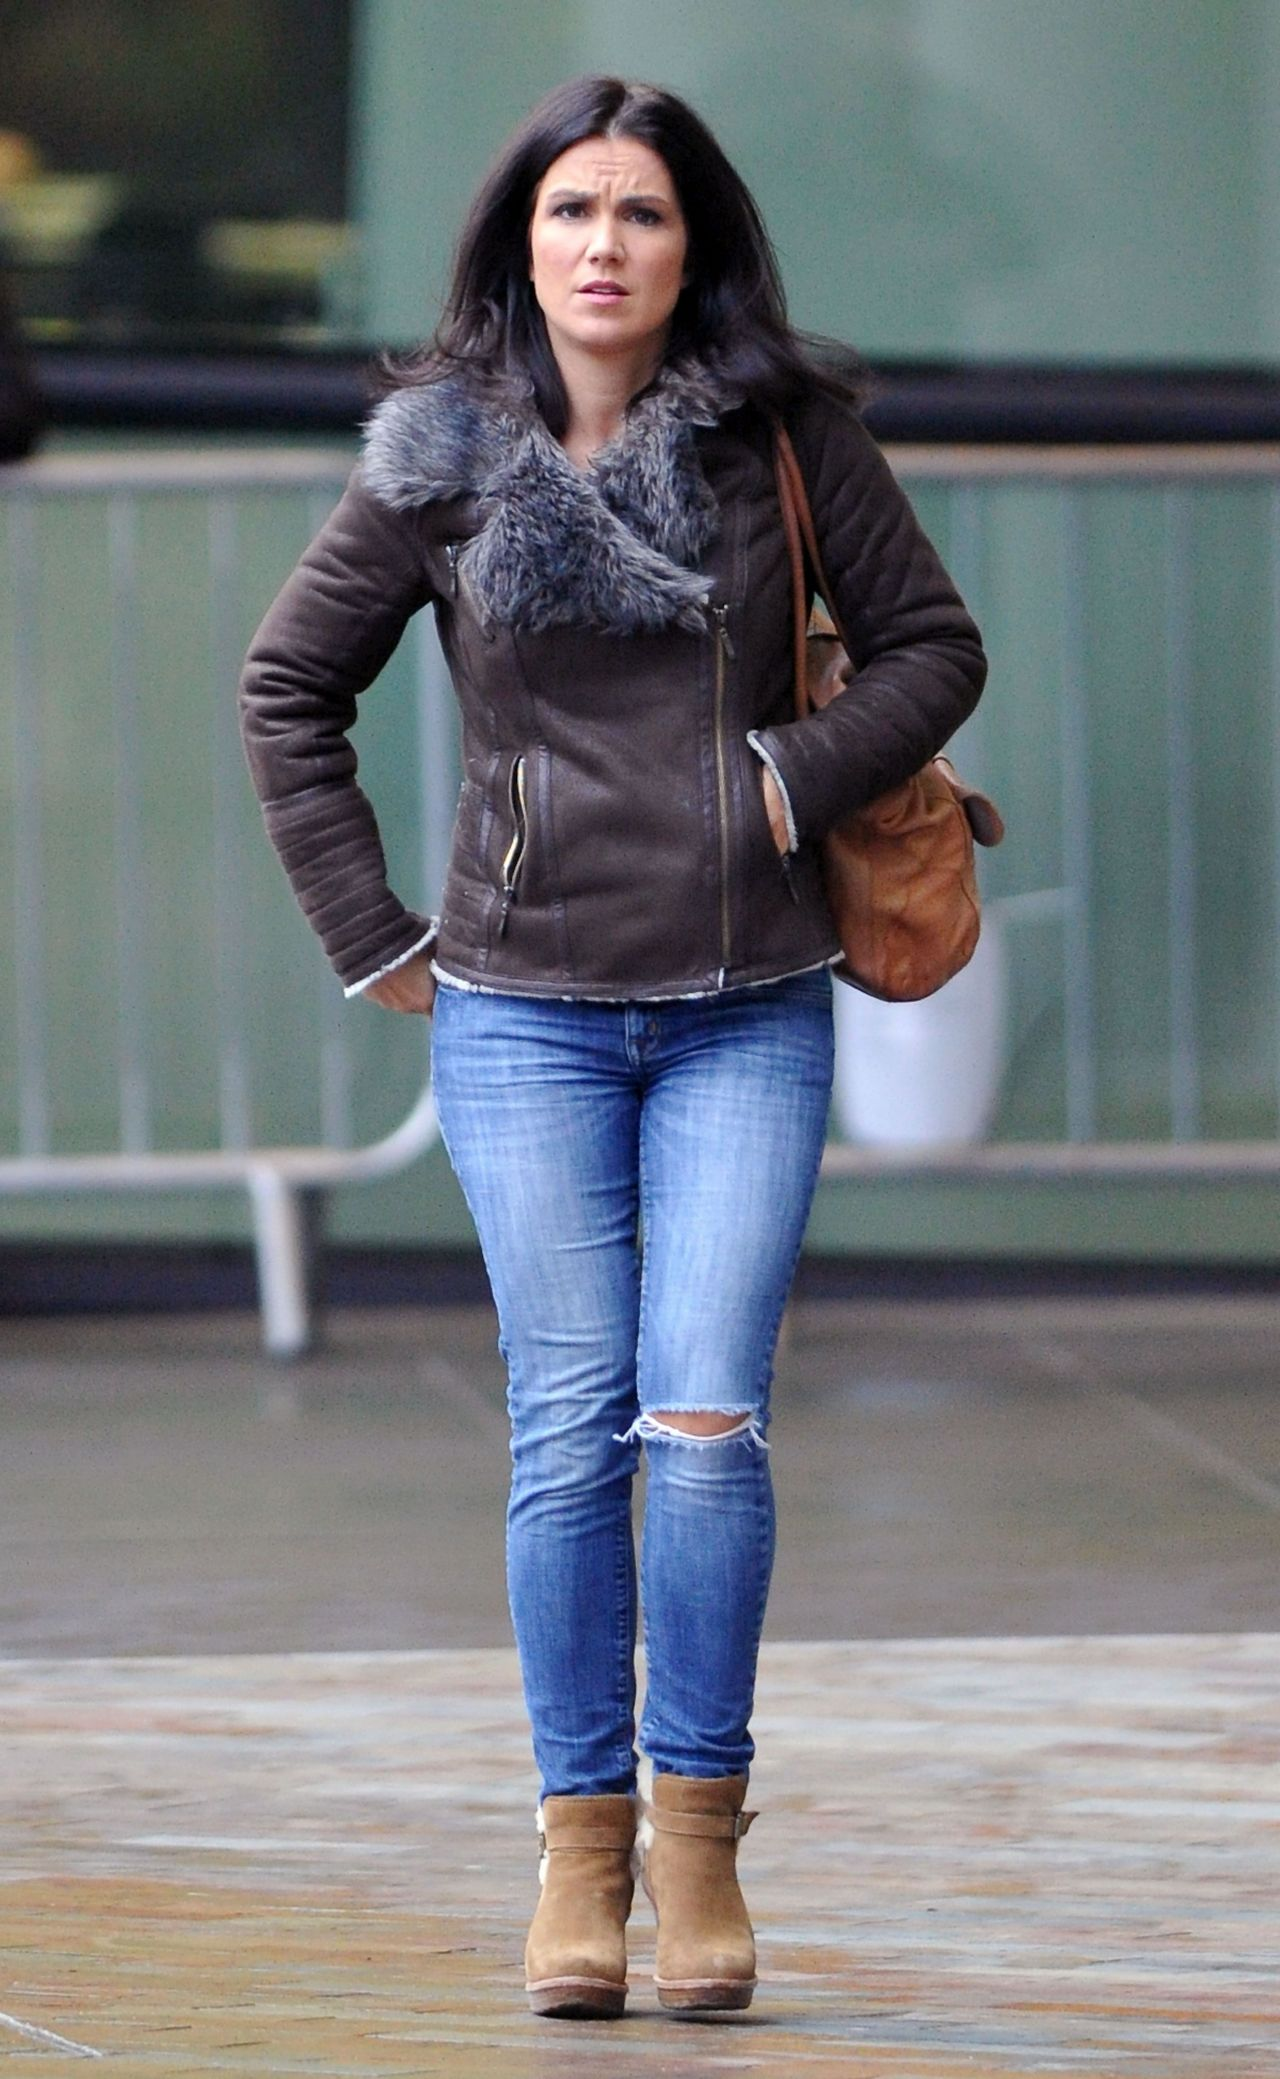 Susanna Reid In Tight Jeans - Bbc Media Studios Manchester -8101